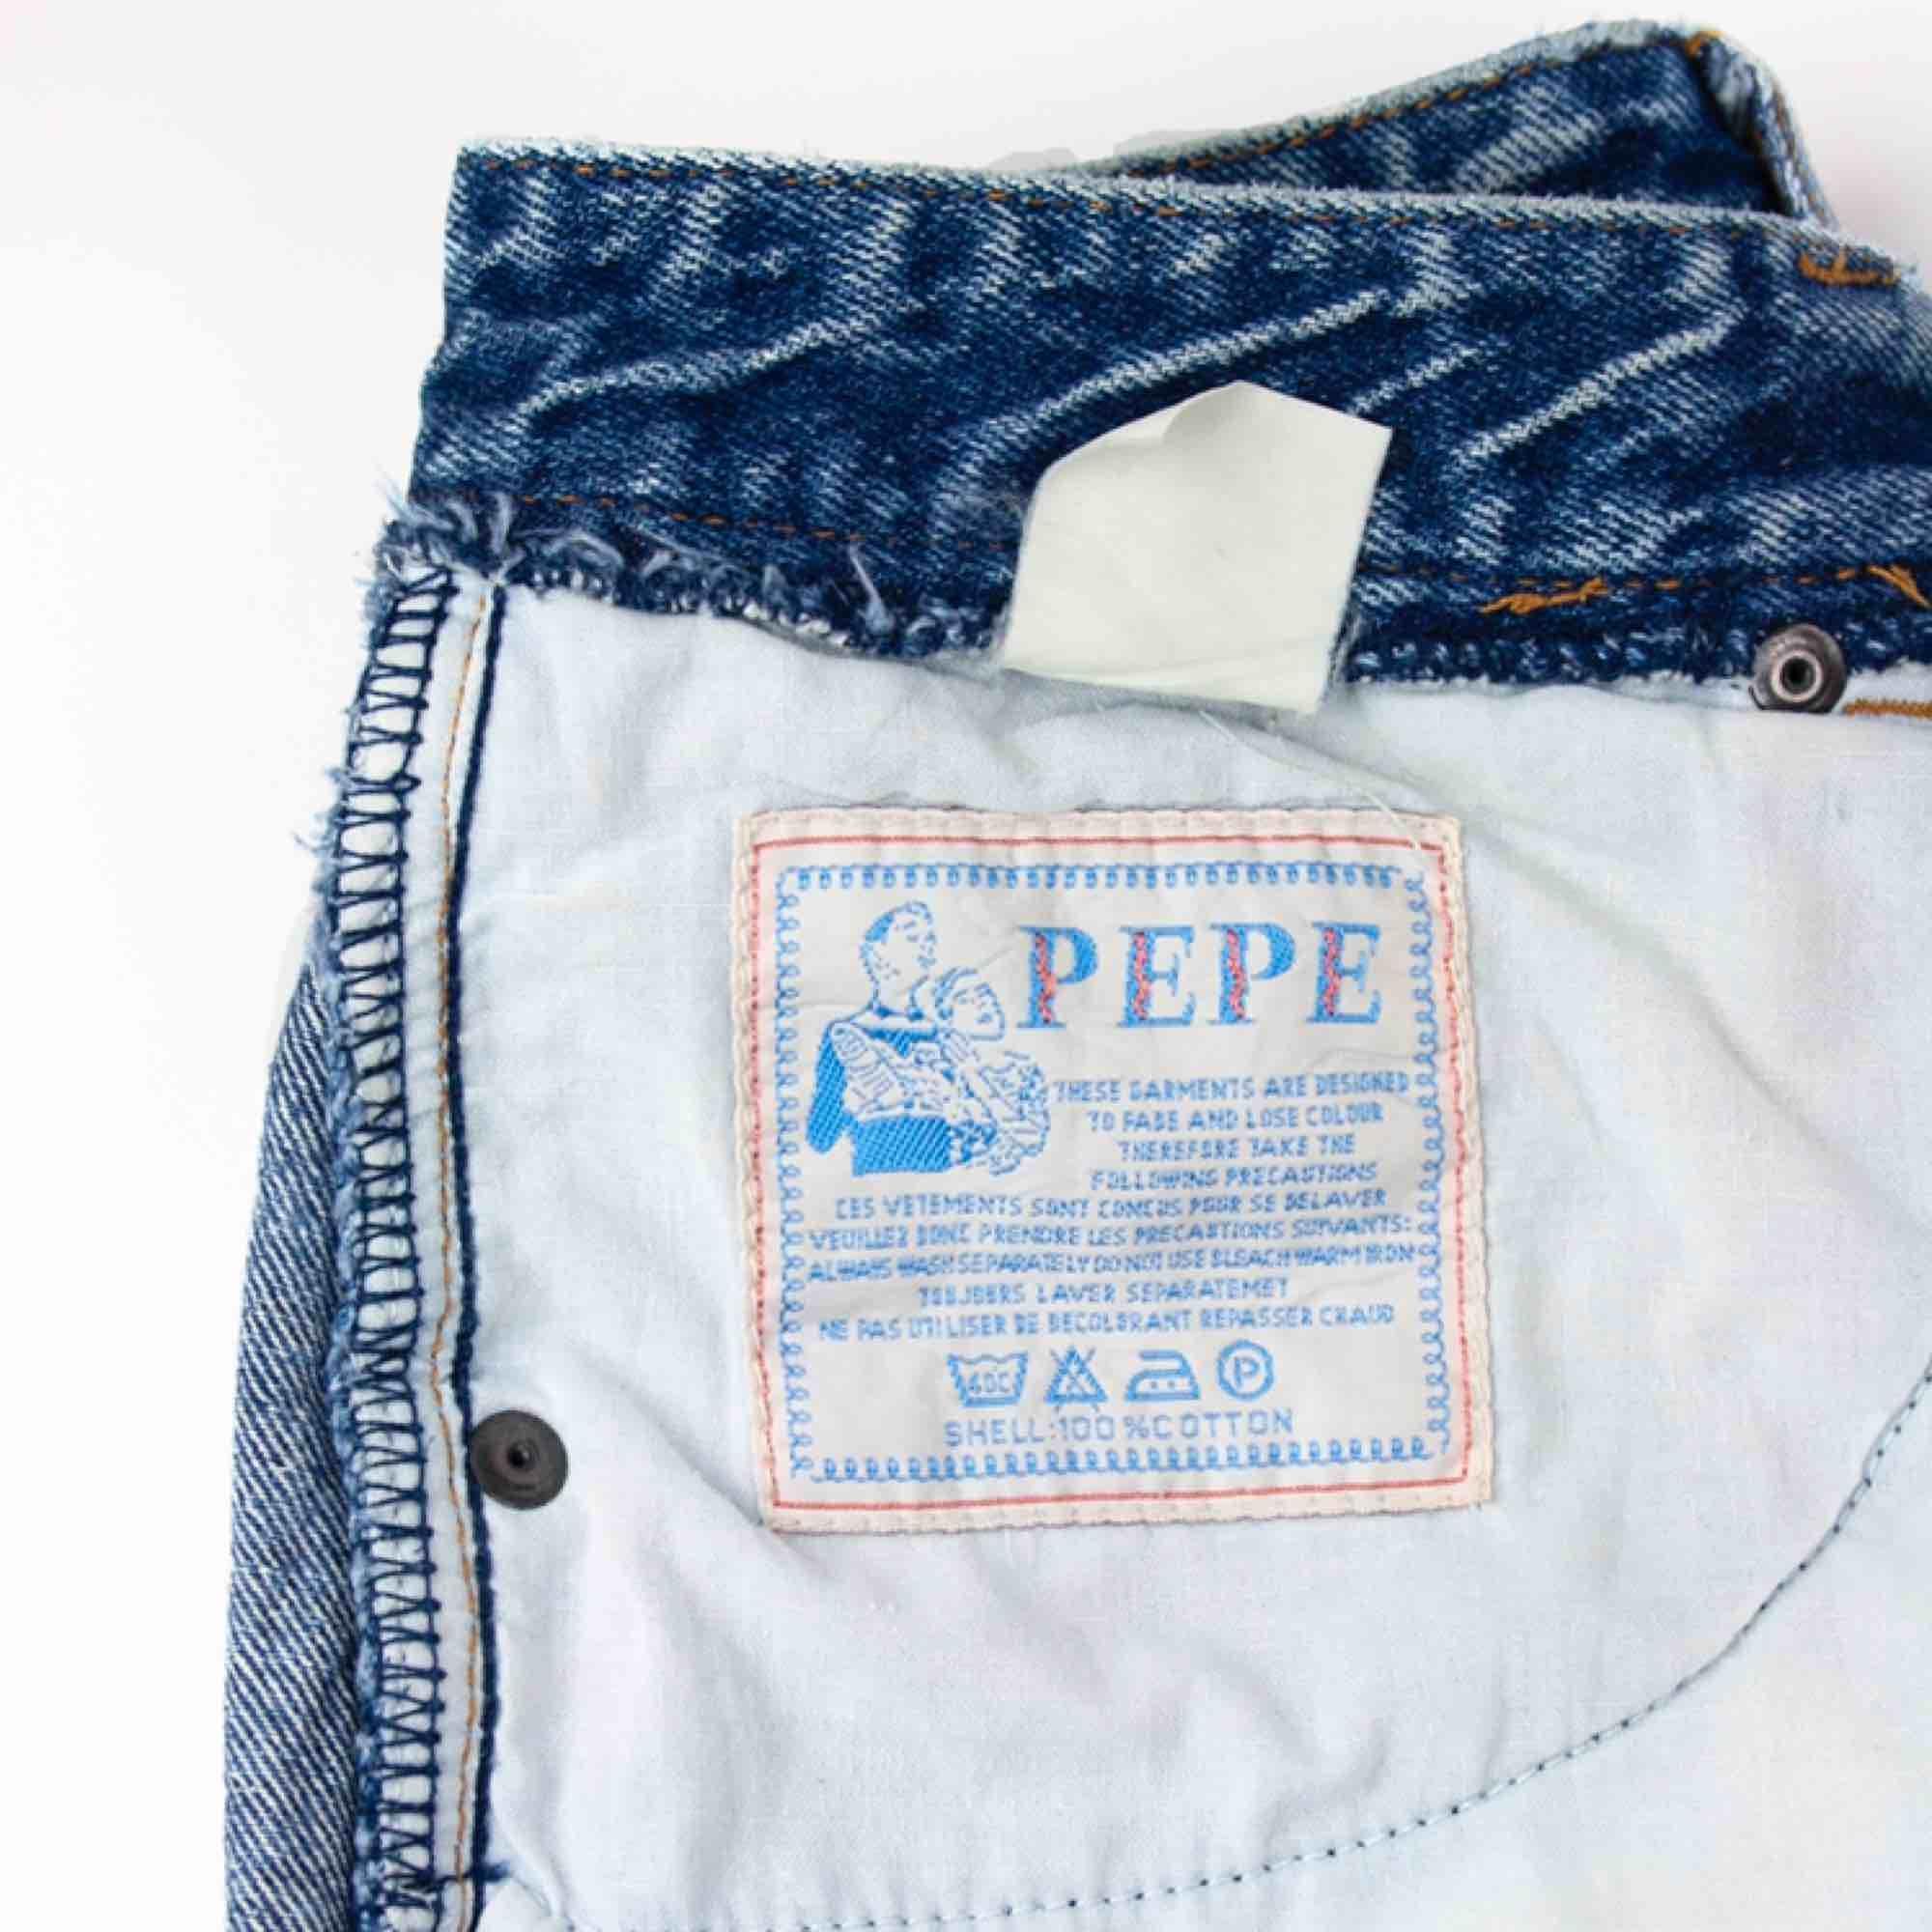 Vintage 90s acid wash high waist denim cut off shorts in blue SIZE Label missing, fit best XS-S Model: 161/S Measurements (flat): inseam: 19 waist: 34 cm/ 13.4